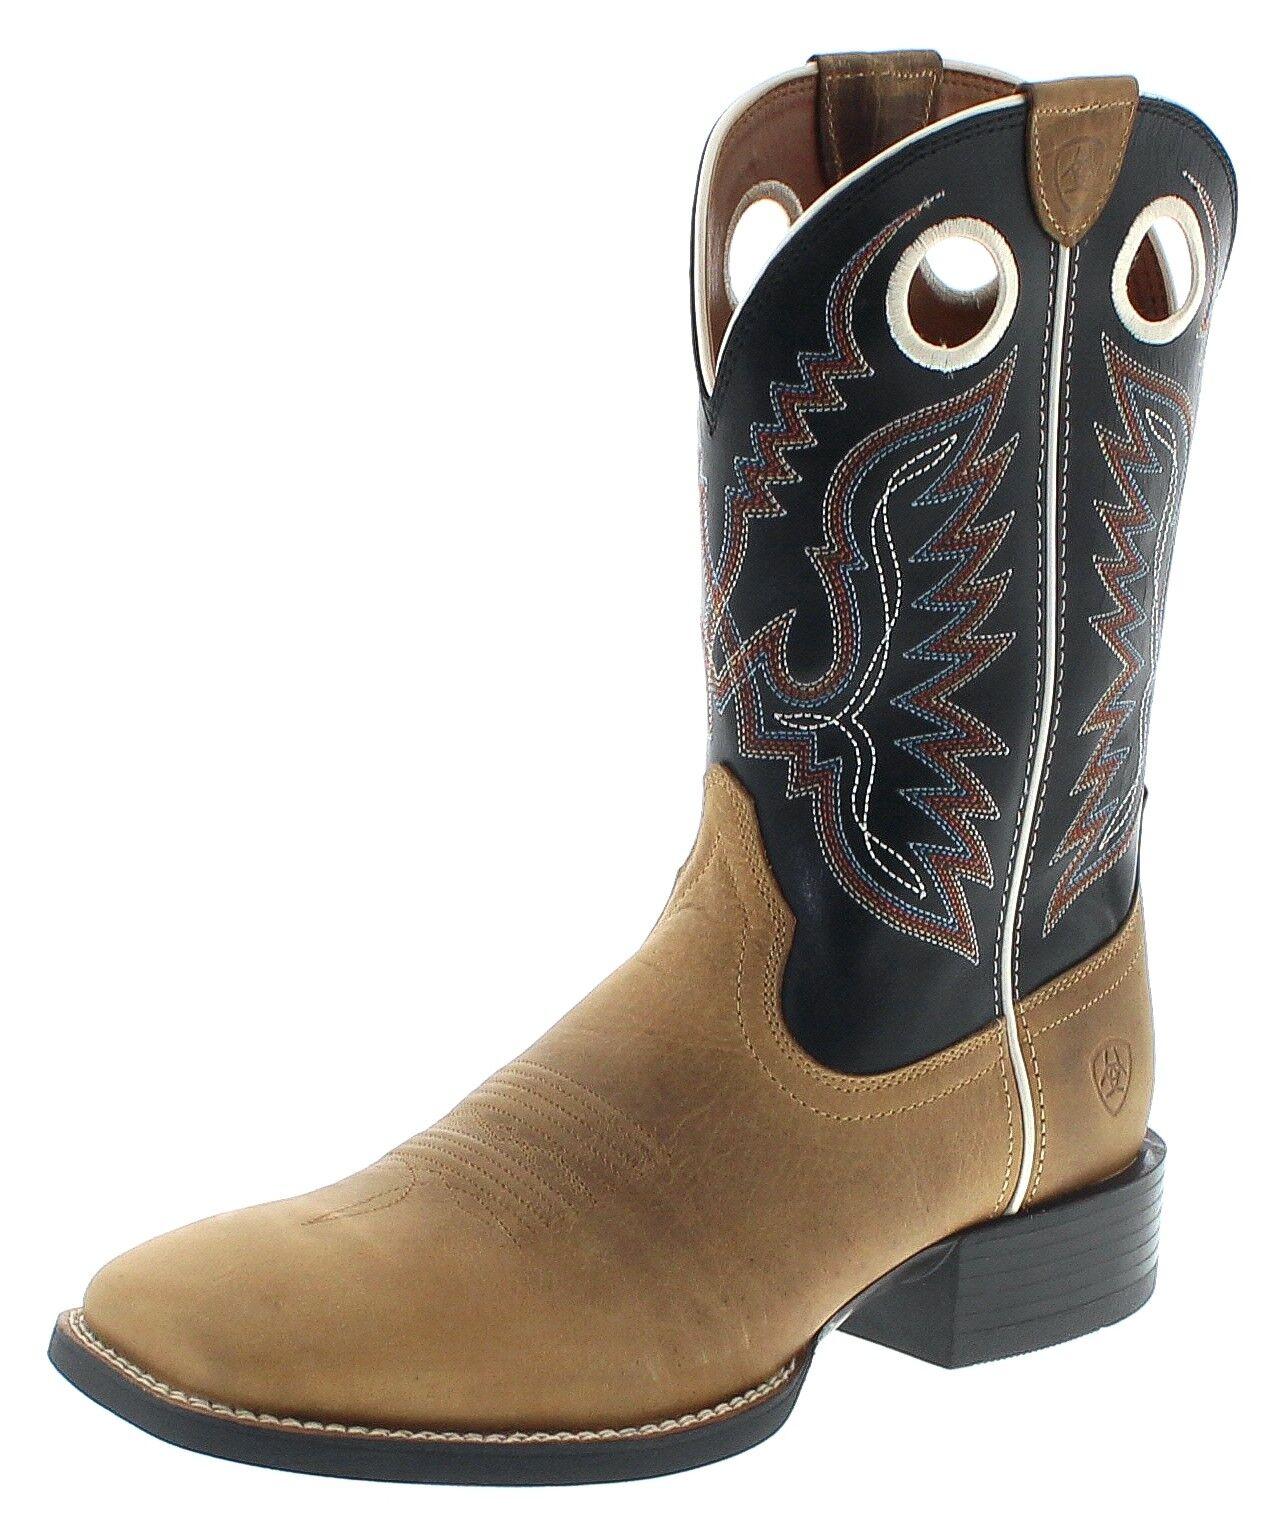 Ariat 23198 Sport Range señores Western botas beige botas de cuero